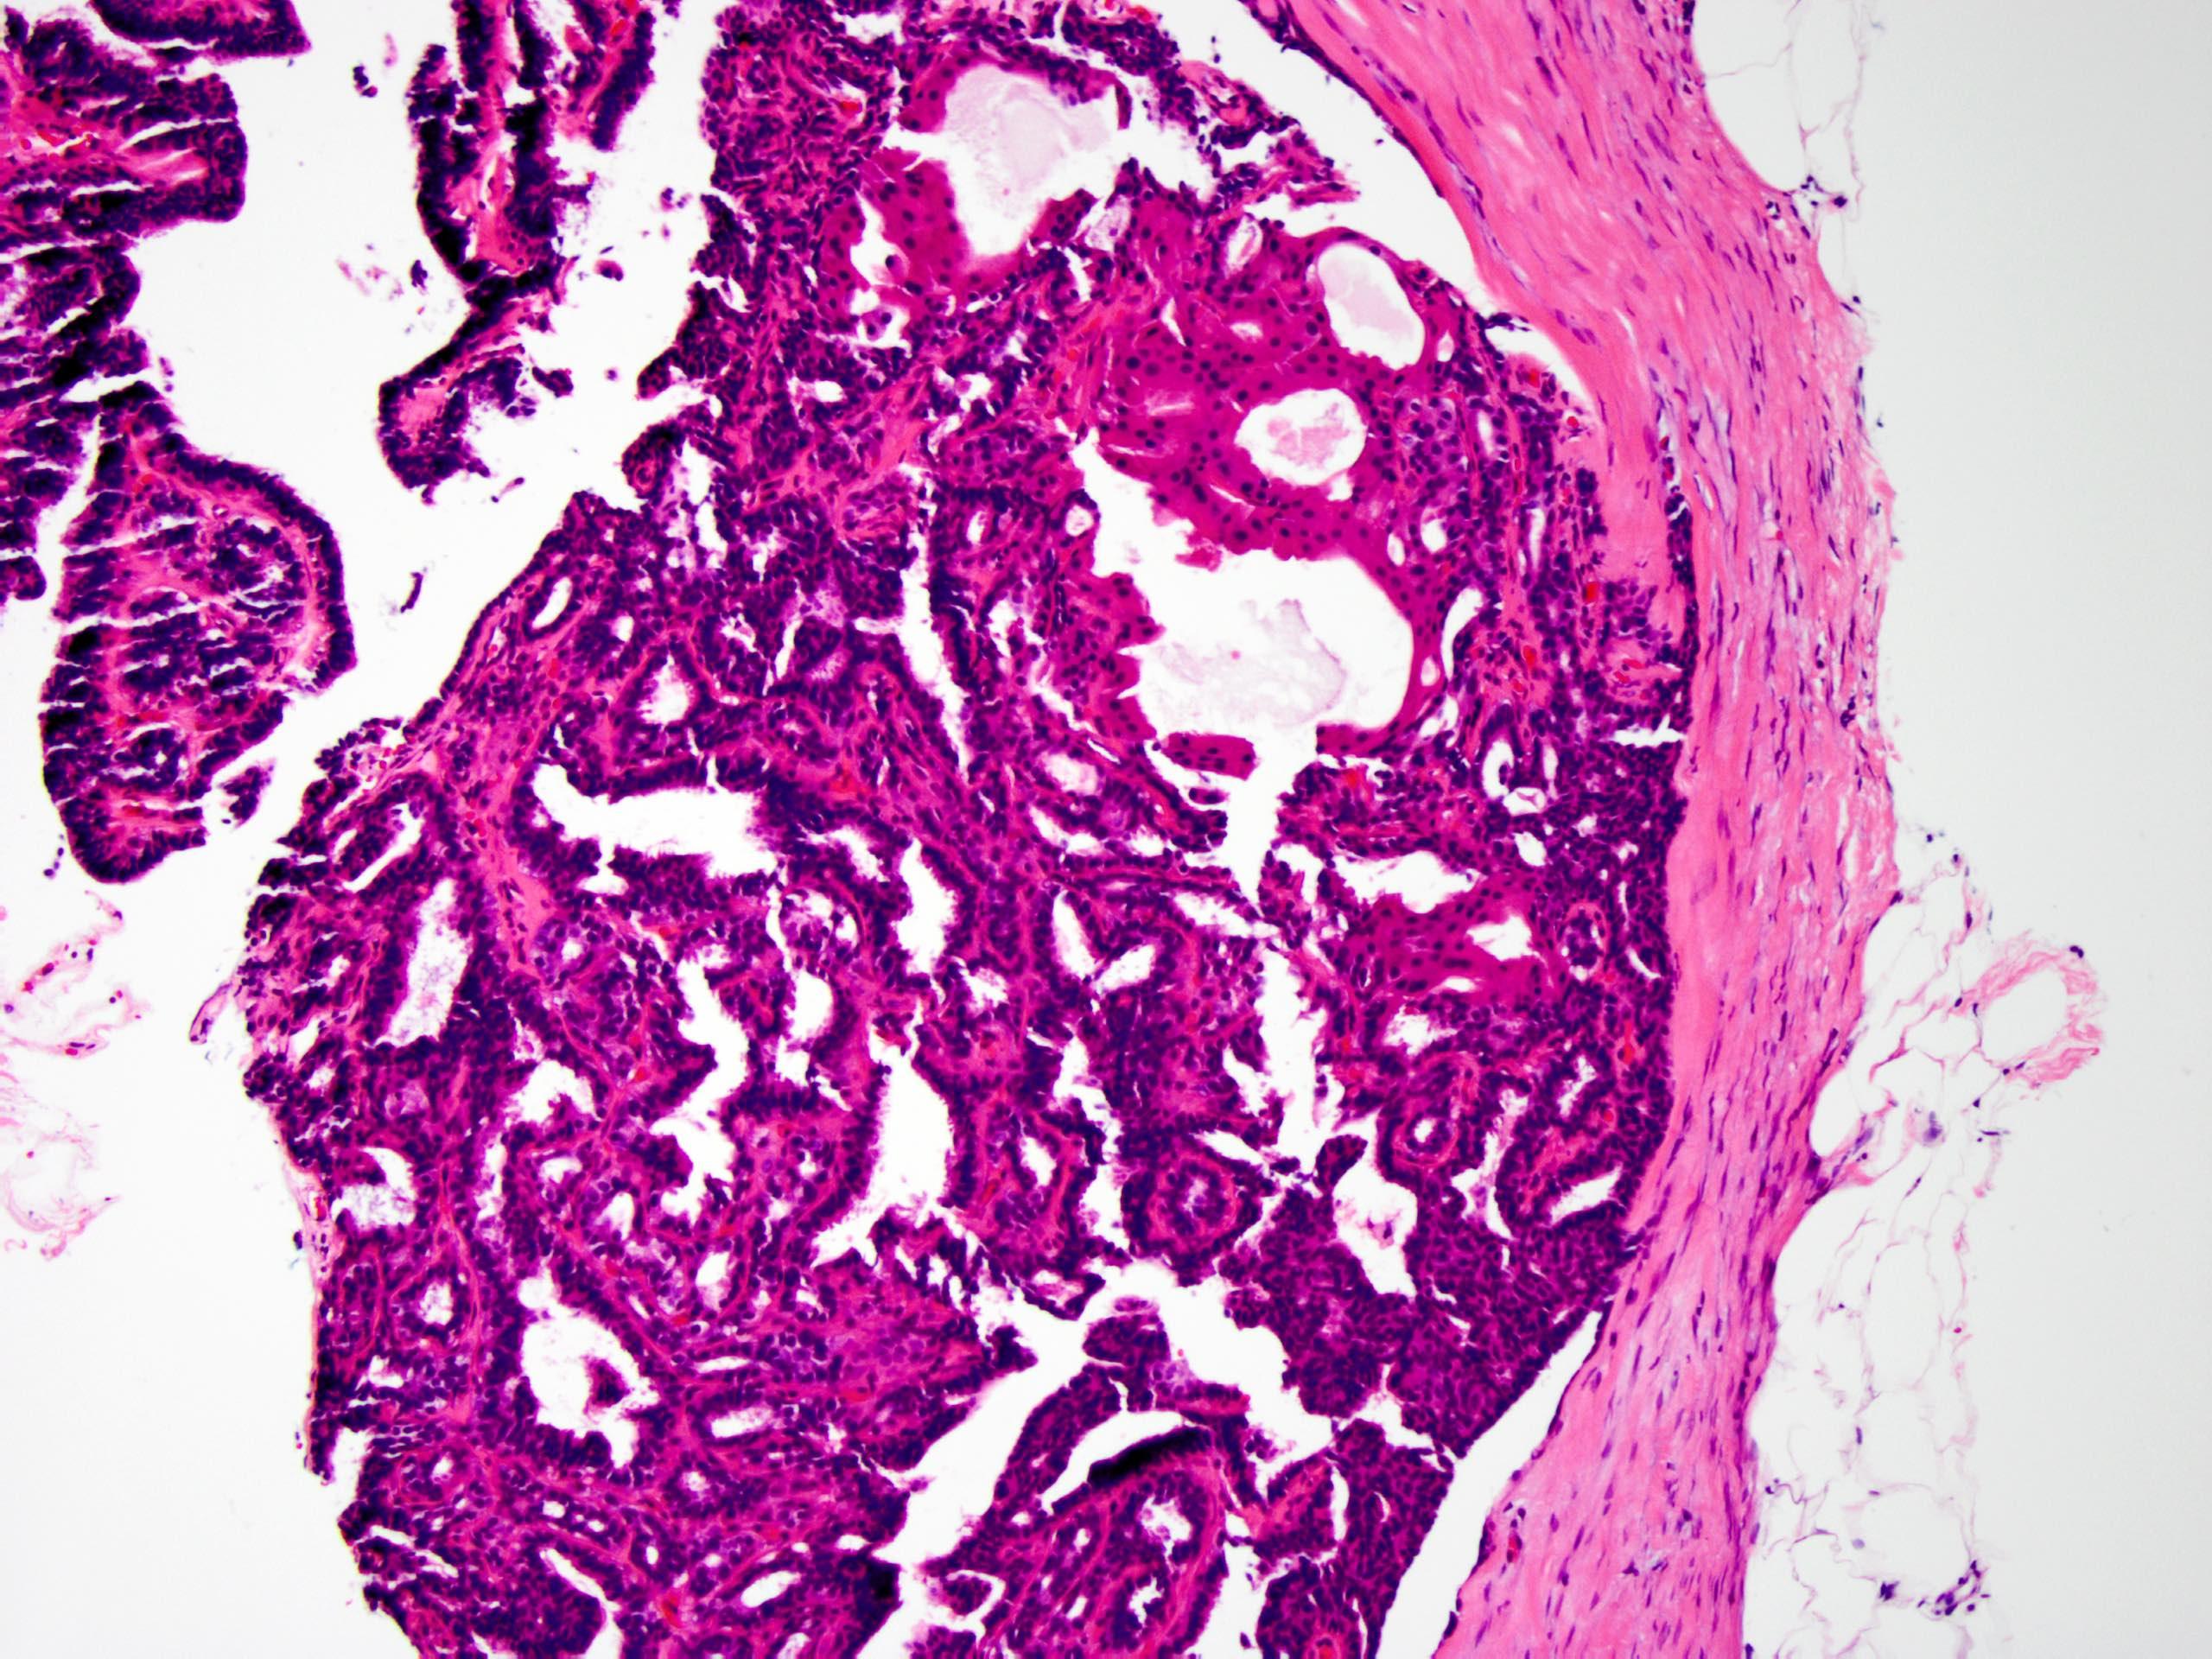 Involved by apocrine metaplasia